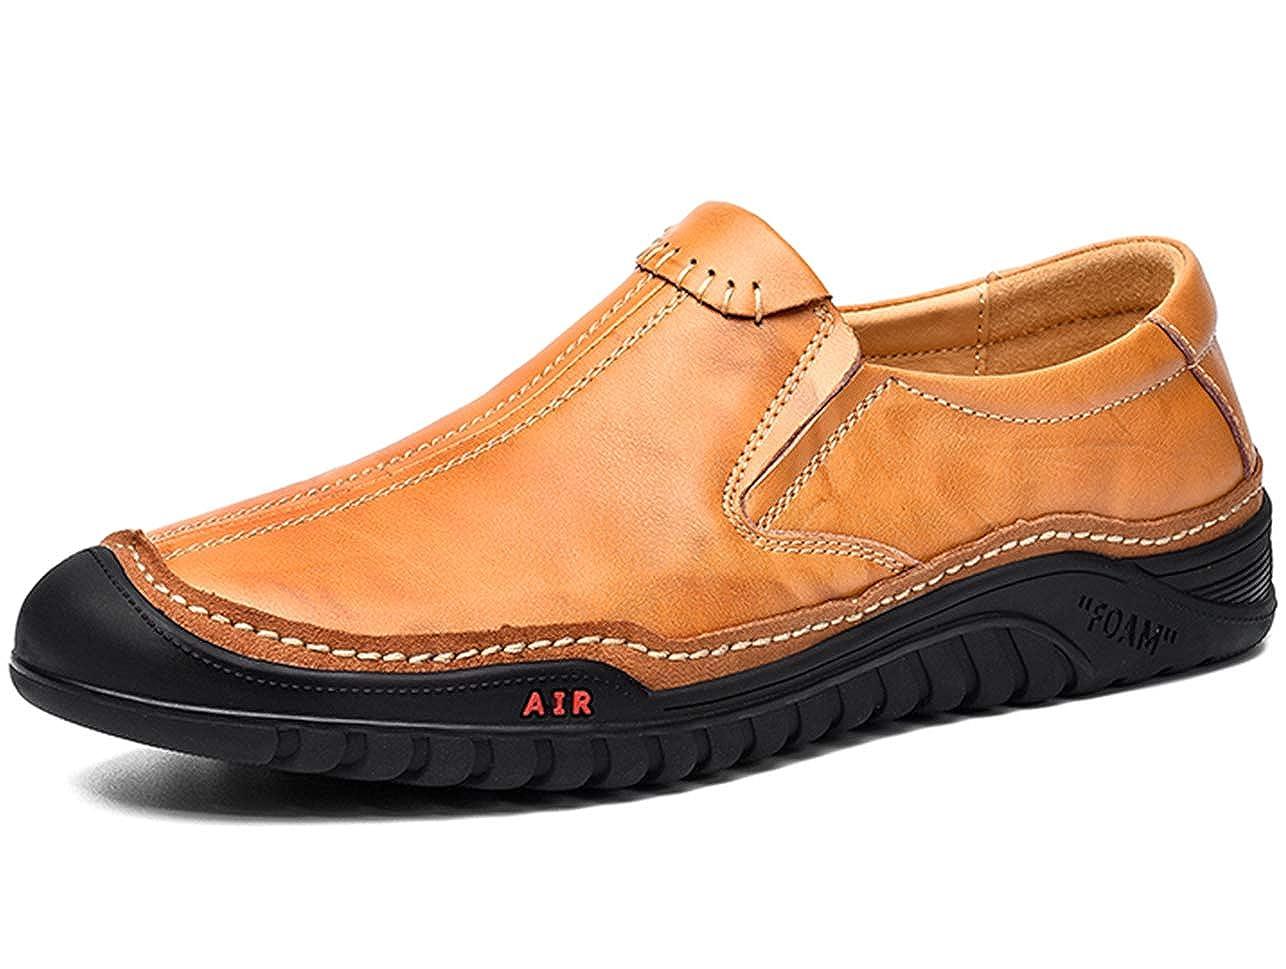 Para B Uomo Geox Sandal U6224b00050c5004 Sandalias Strada Hombre TJcuFlK351